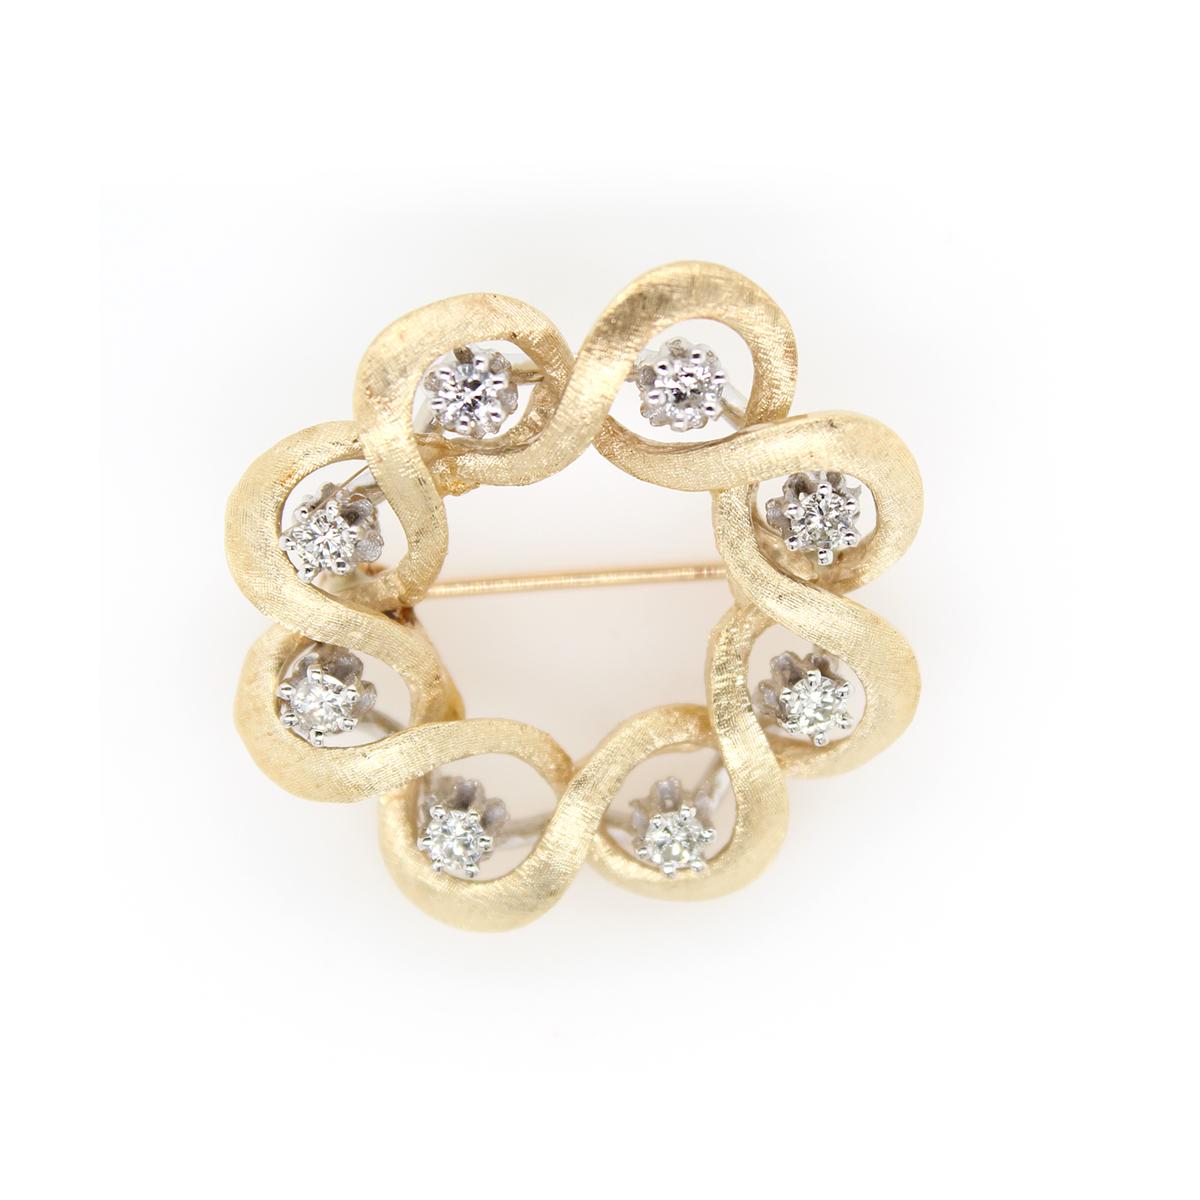 Vintage 14 Karat Yellow Gold Diamond Woven Brooch